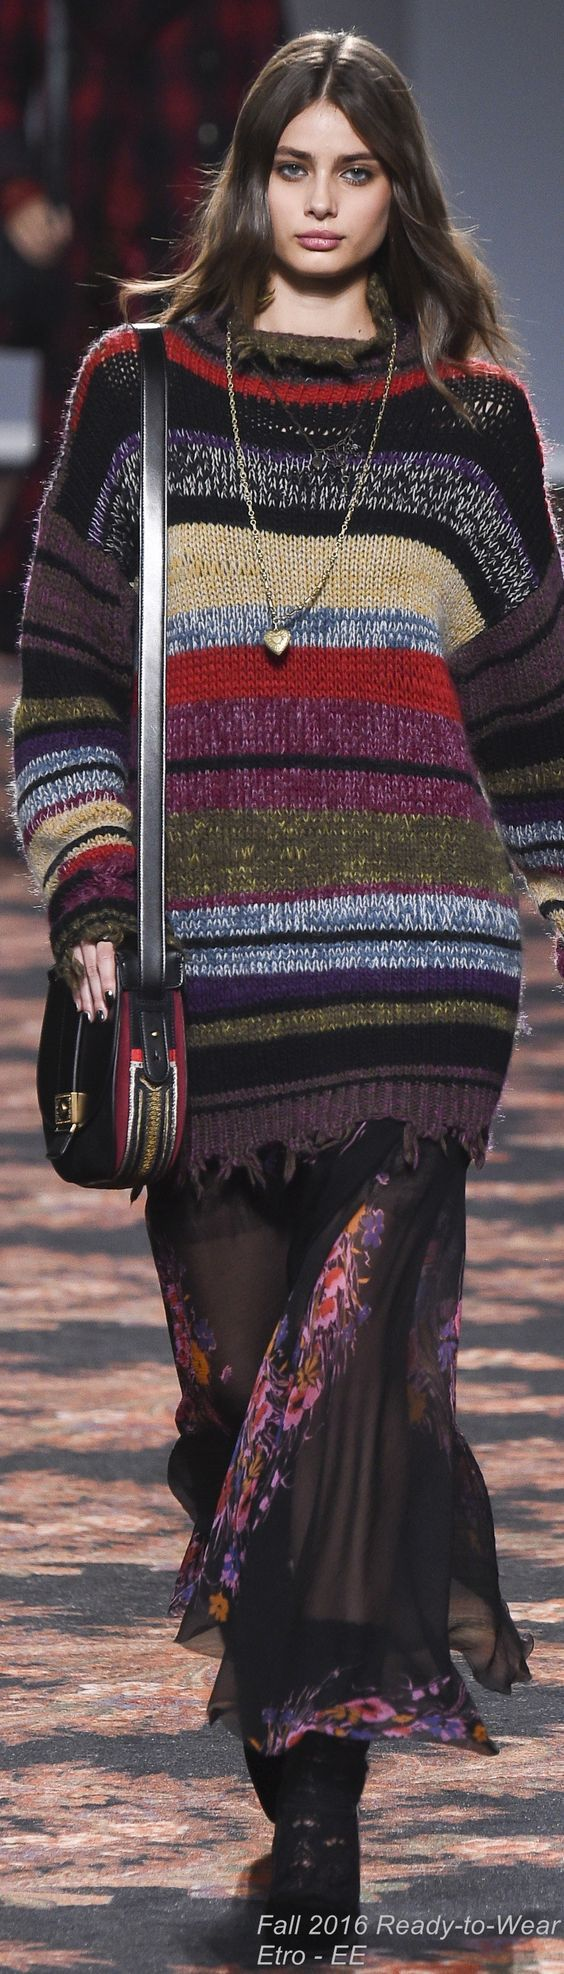 Fall 2016 Ready-to-Wear Etro: